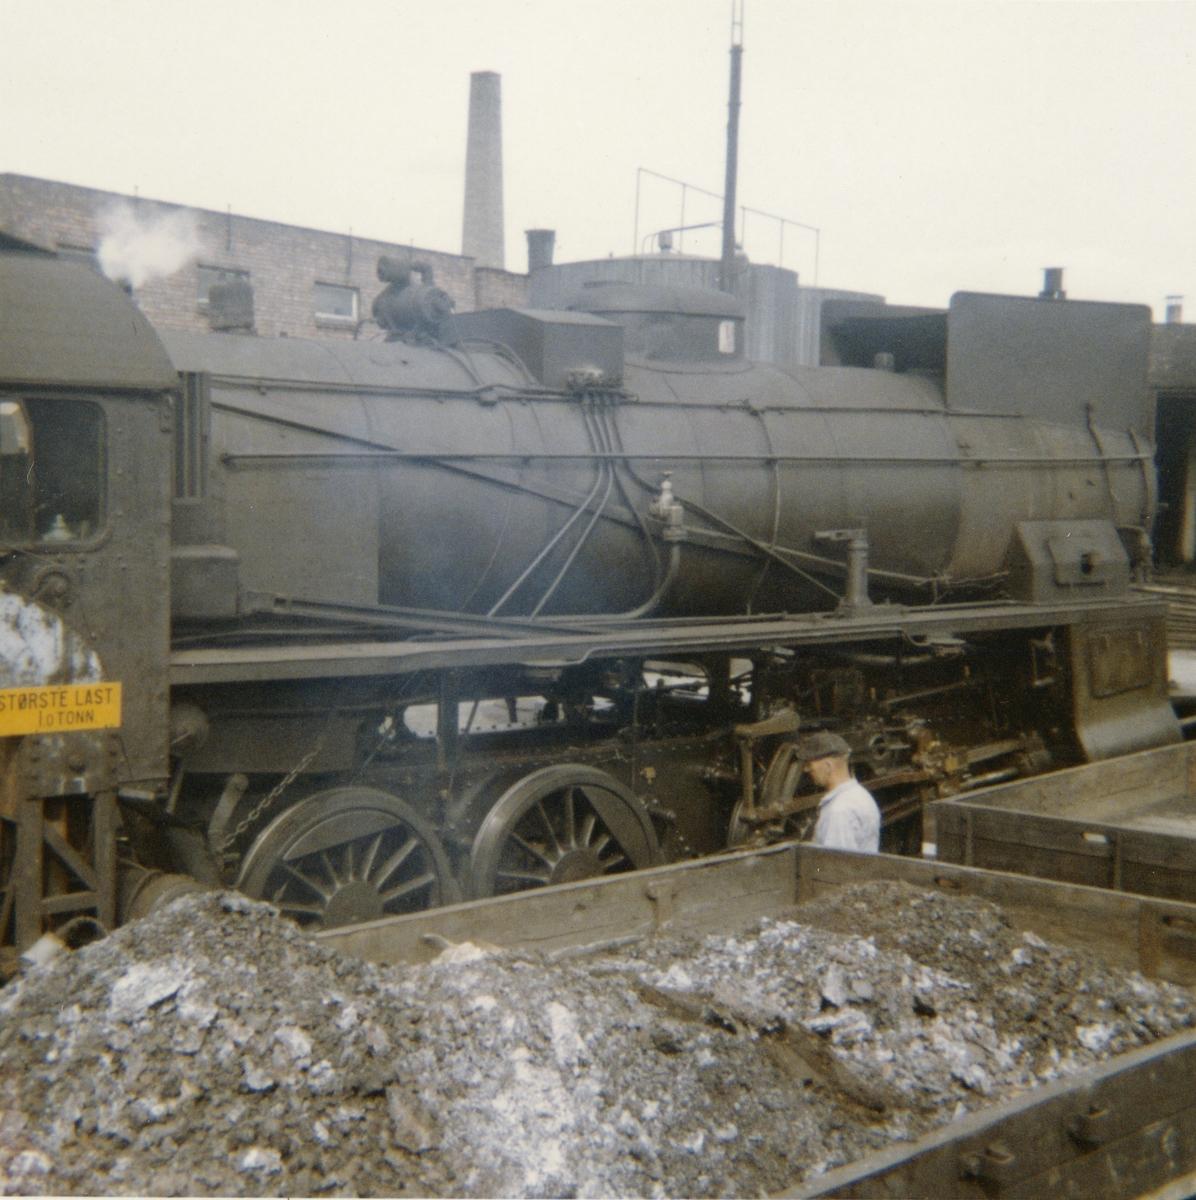 Damplokomotiv type 31b 416 ved lokomotivstallen på Hamar.